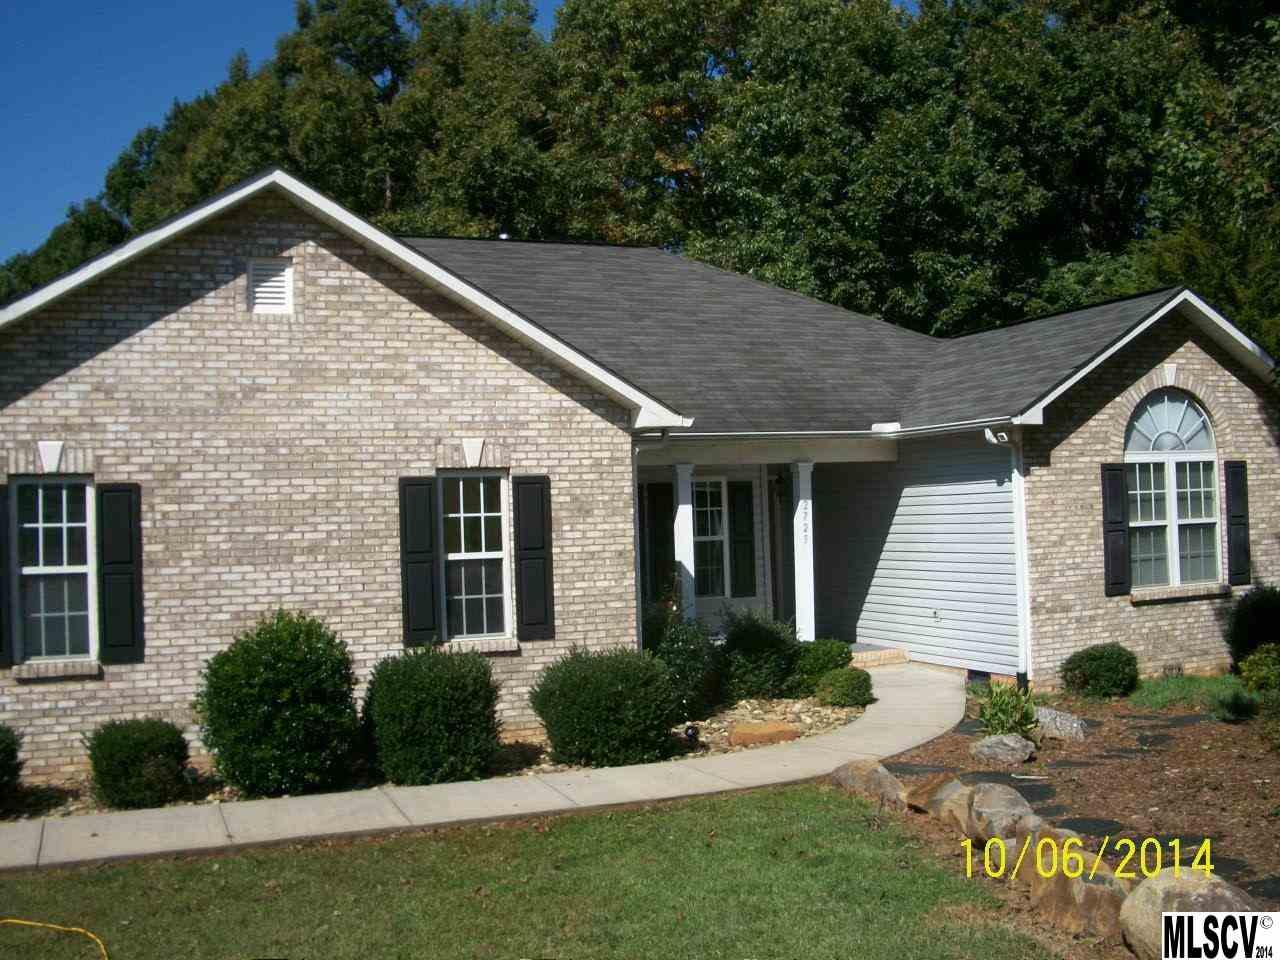 Real Estate for Sale, ListingId: 30189908, Claremont,NC28610